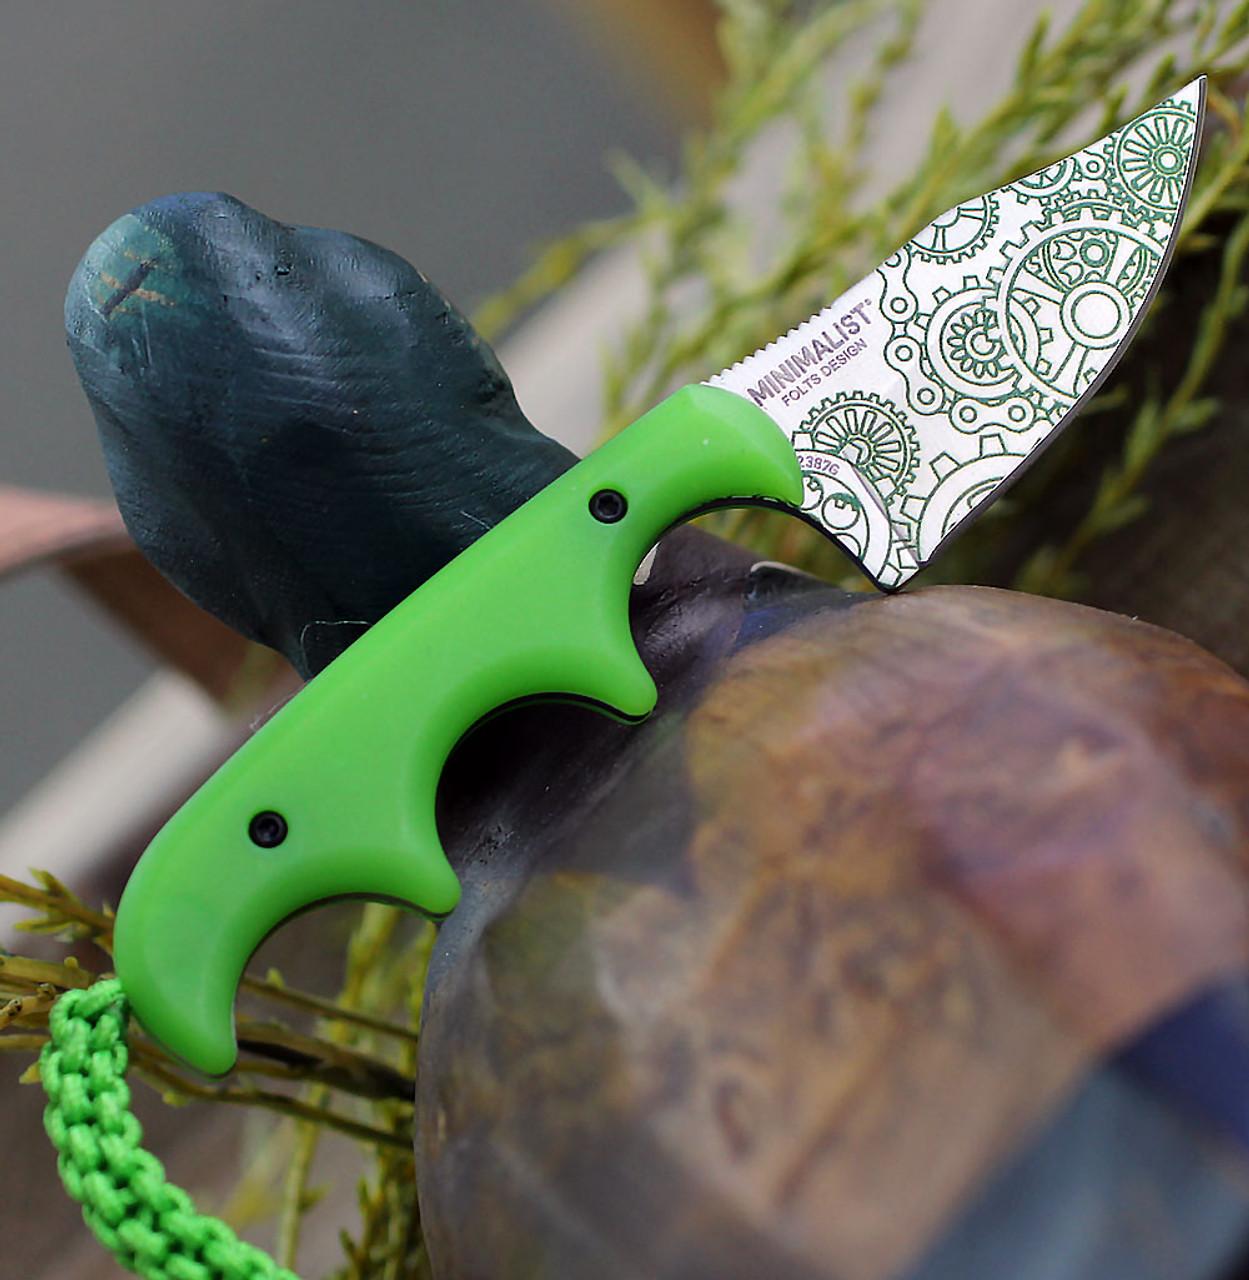 "CRKT Minimalist Bowie Gears CR2387G, 2.125"" 8Cr13MoV 3D Print Satin Blade, Glow in the Dark Handle/Sheath"